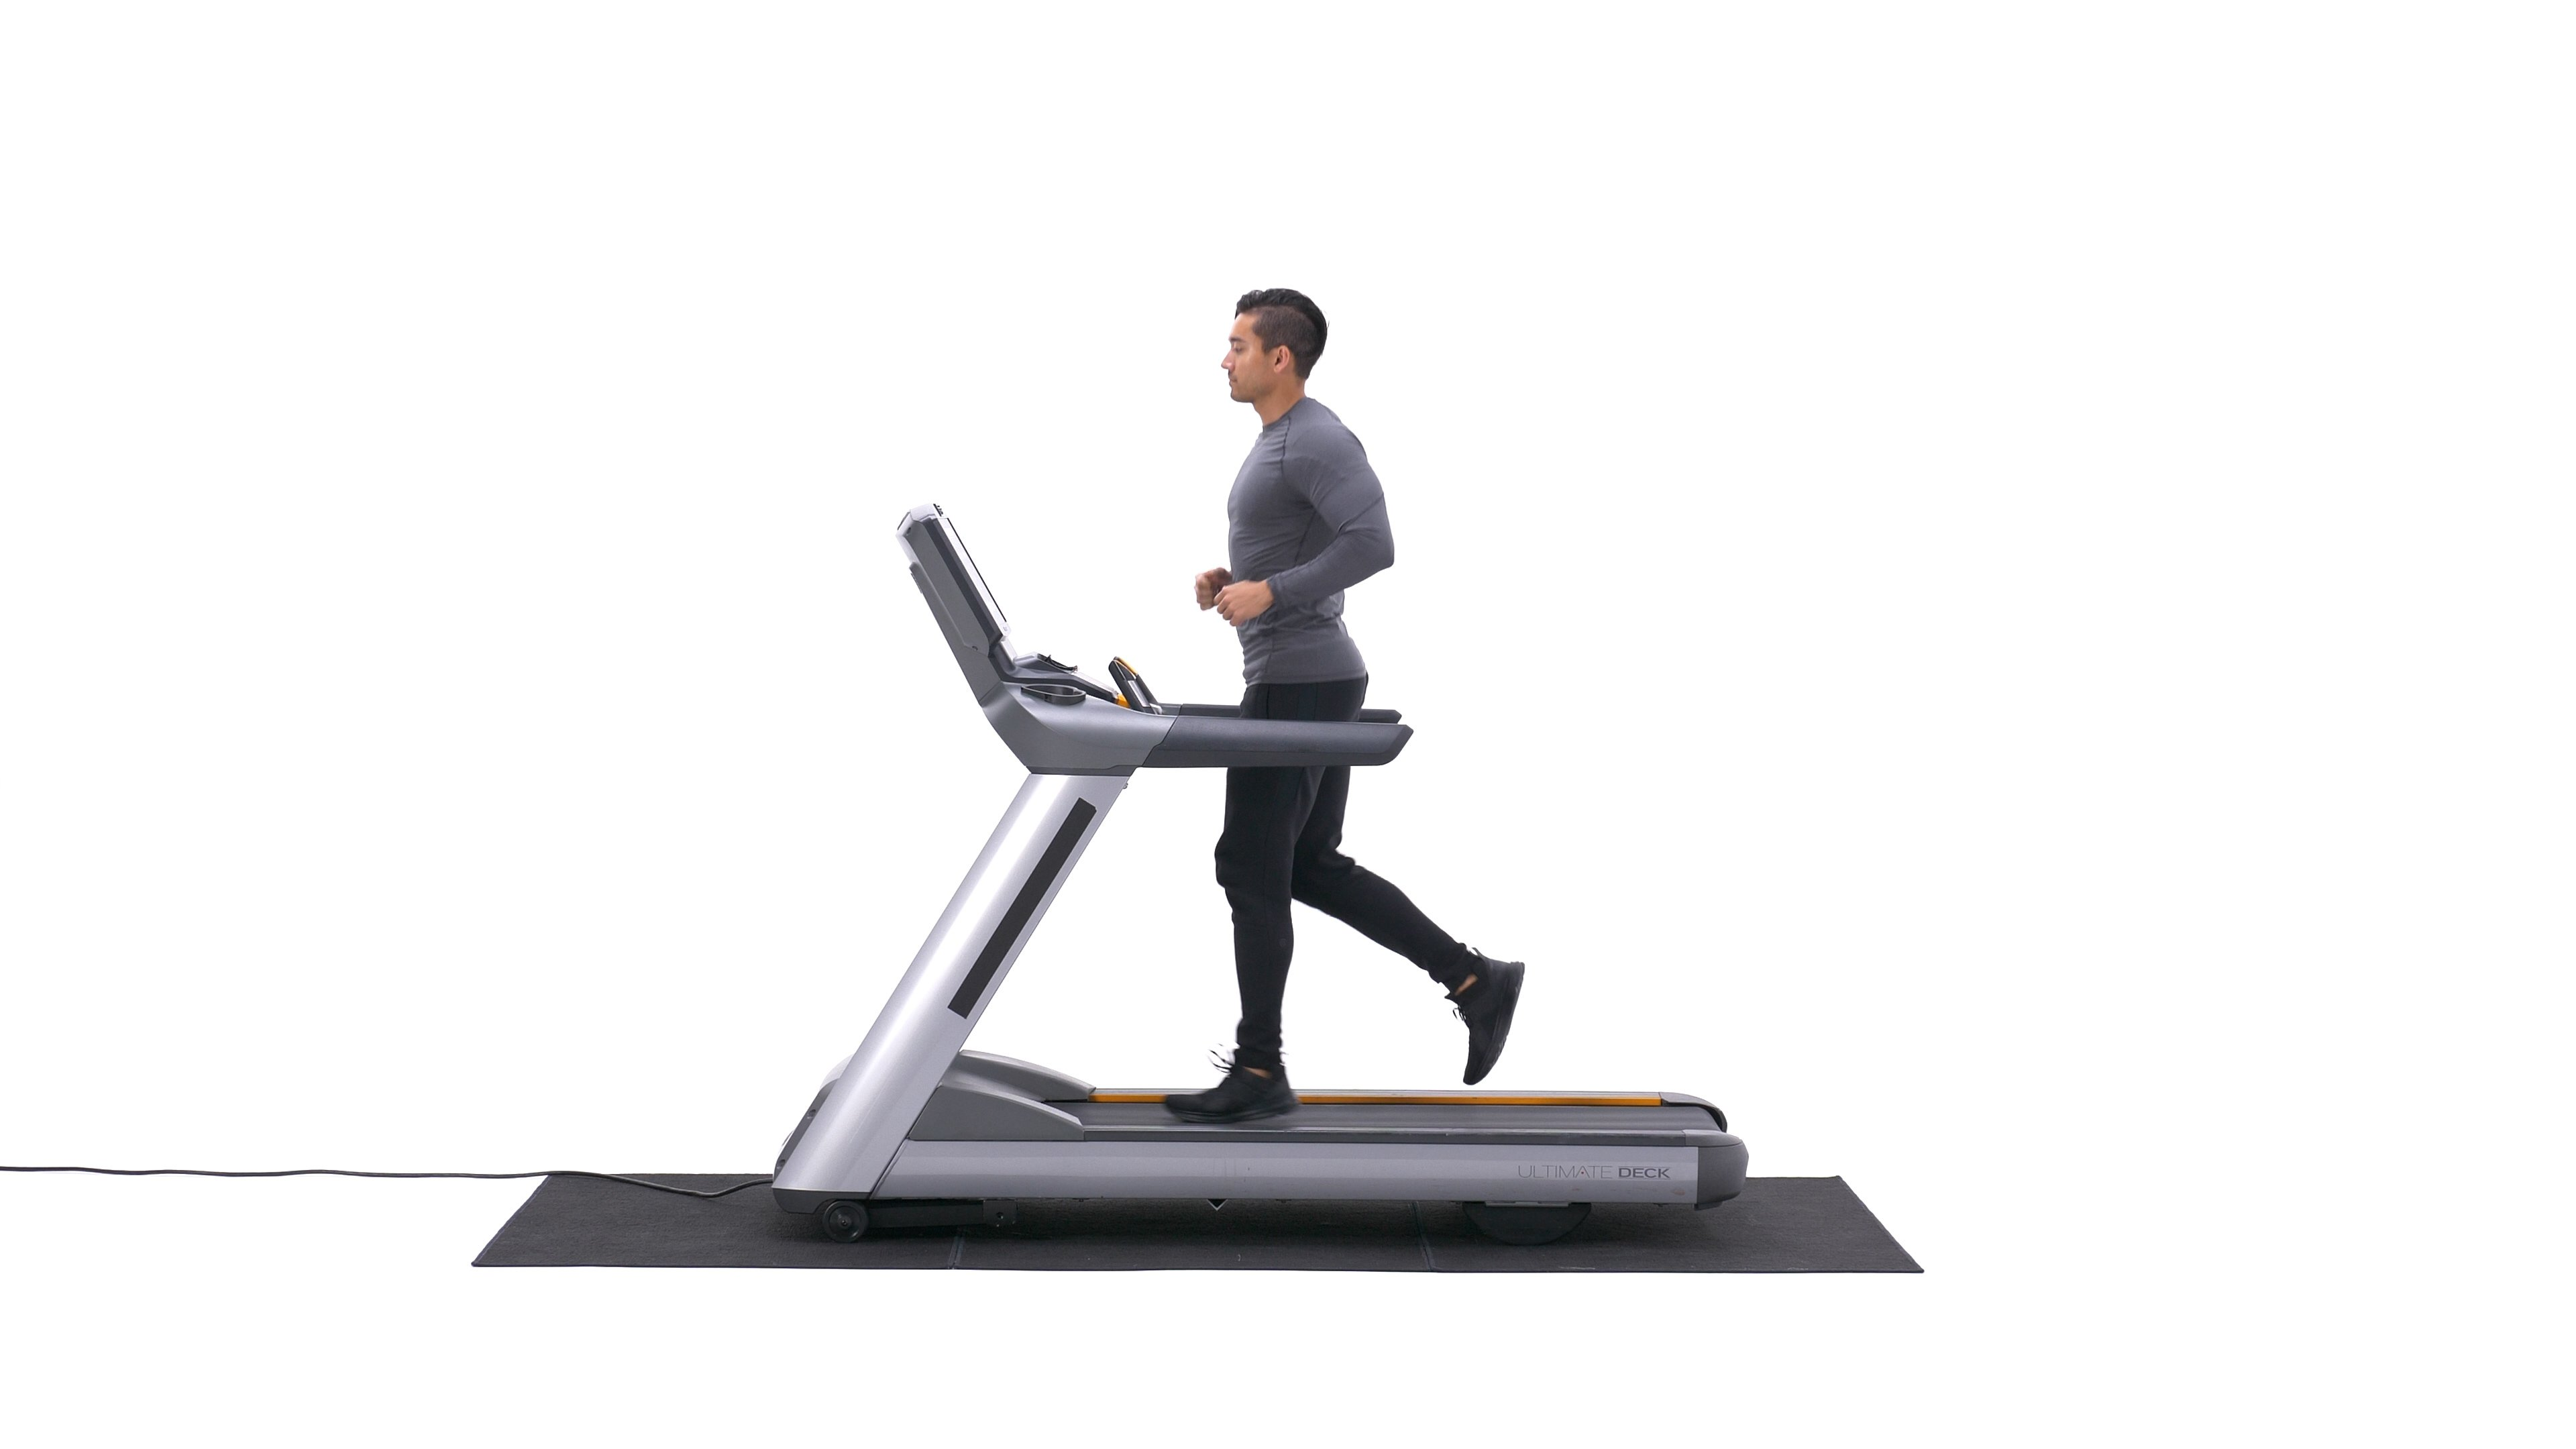 Treadmill jogging image